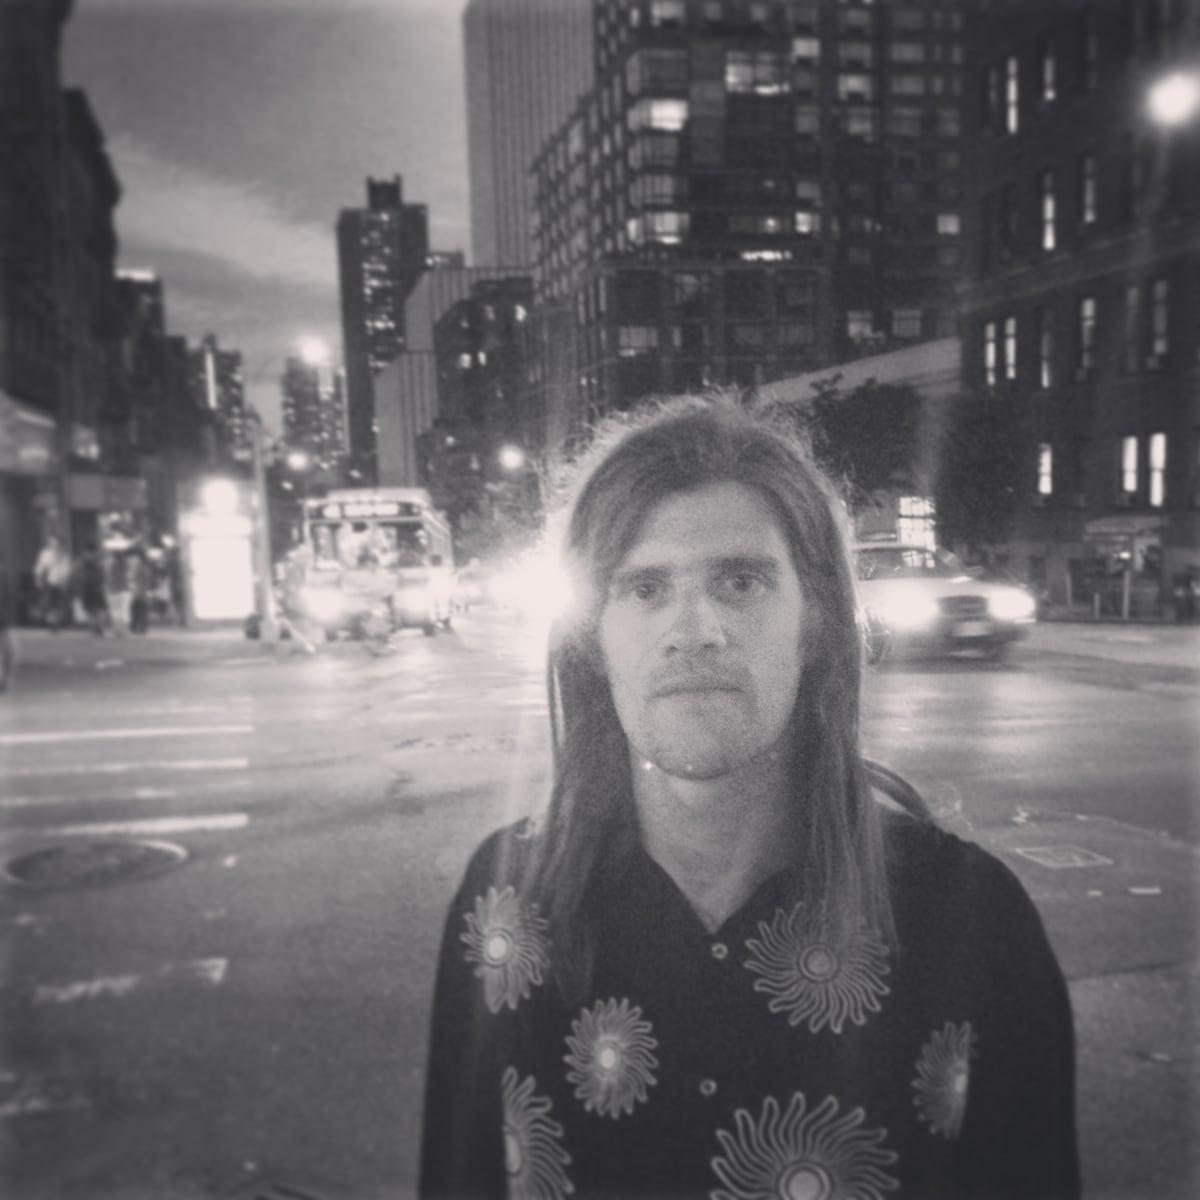 Daniel from Brooklyn